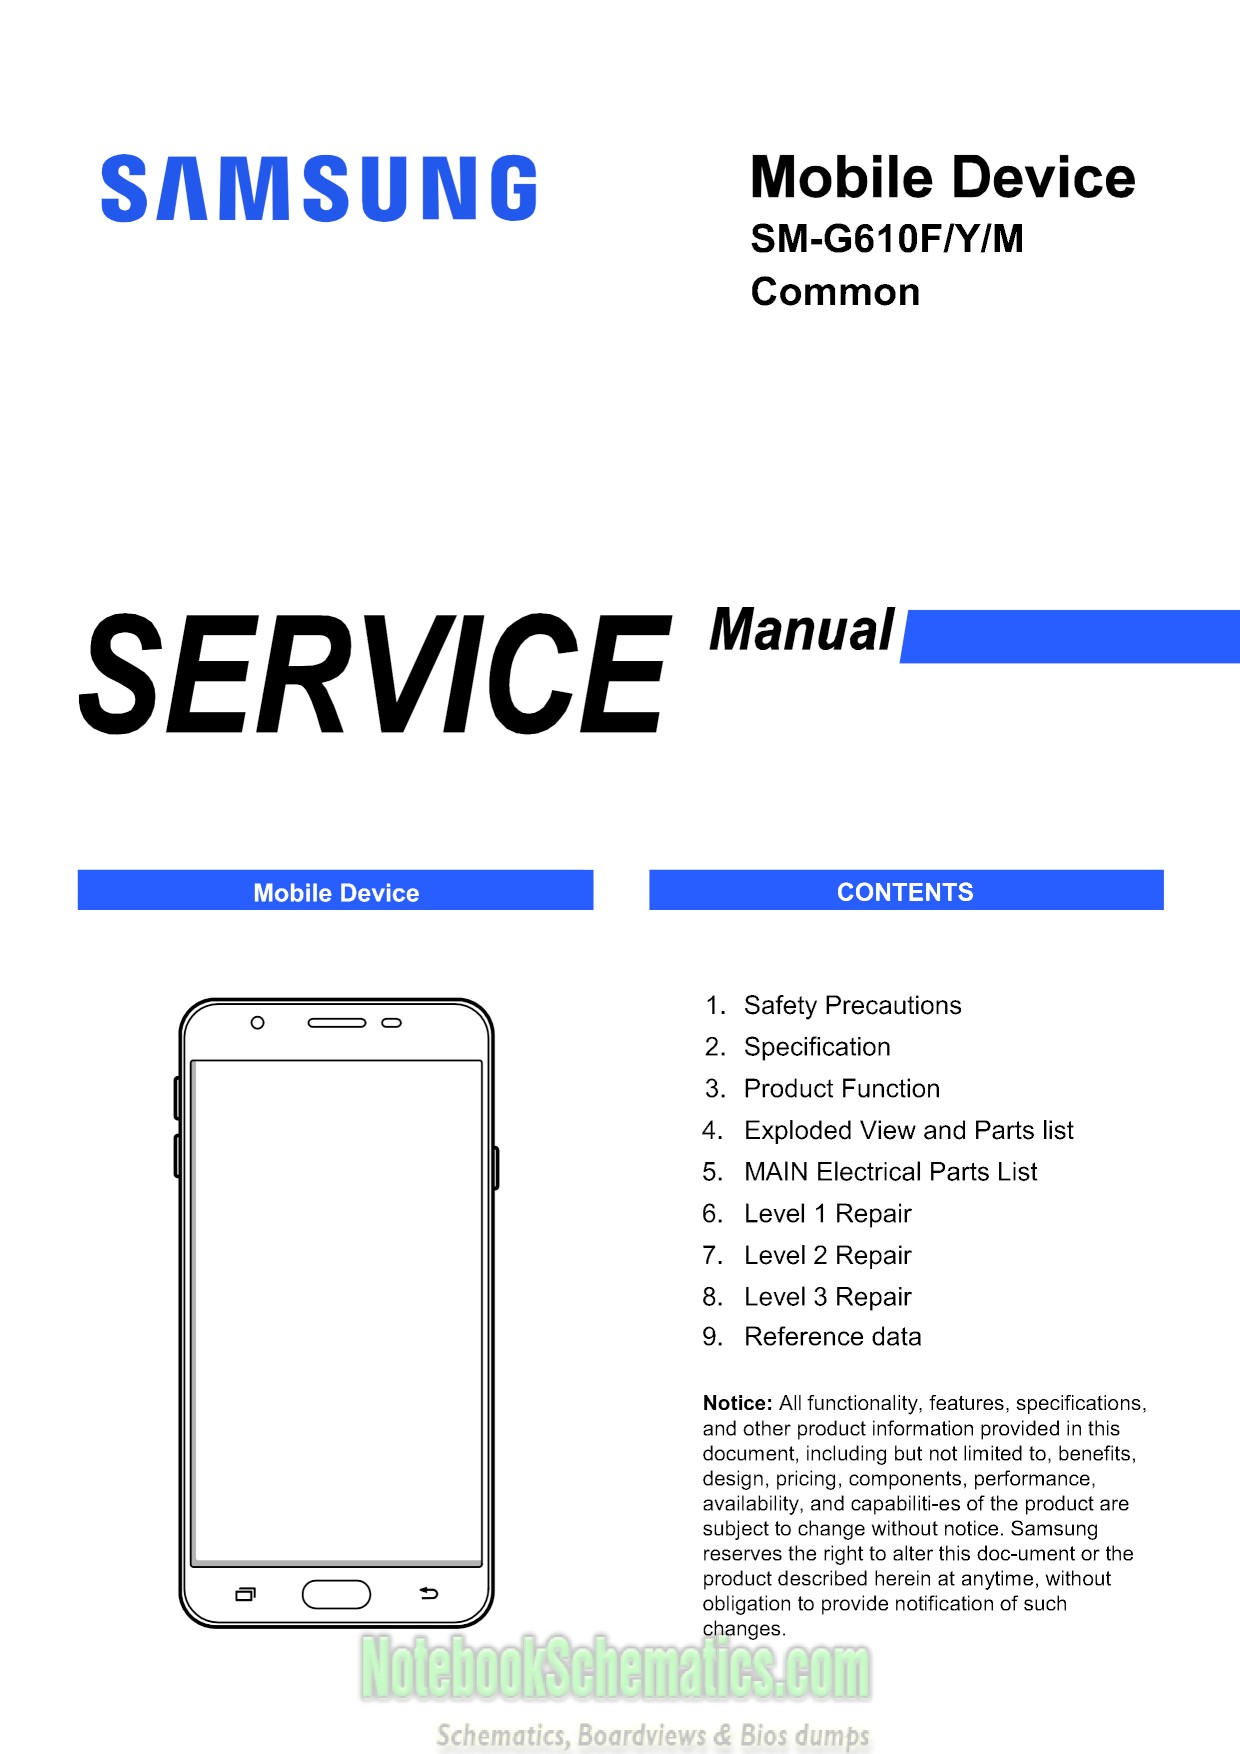 samsung galaxy j7 prime service manual sm g610f   sm g610y   sm g610m service manual sony vaio notebook service manual sony vaio notebook repair manual